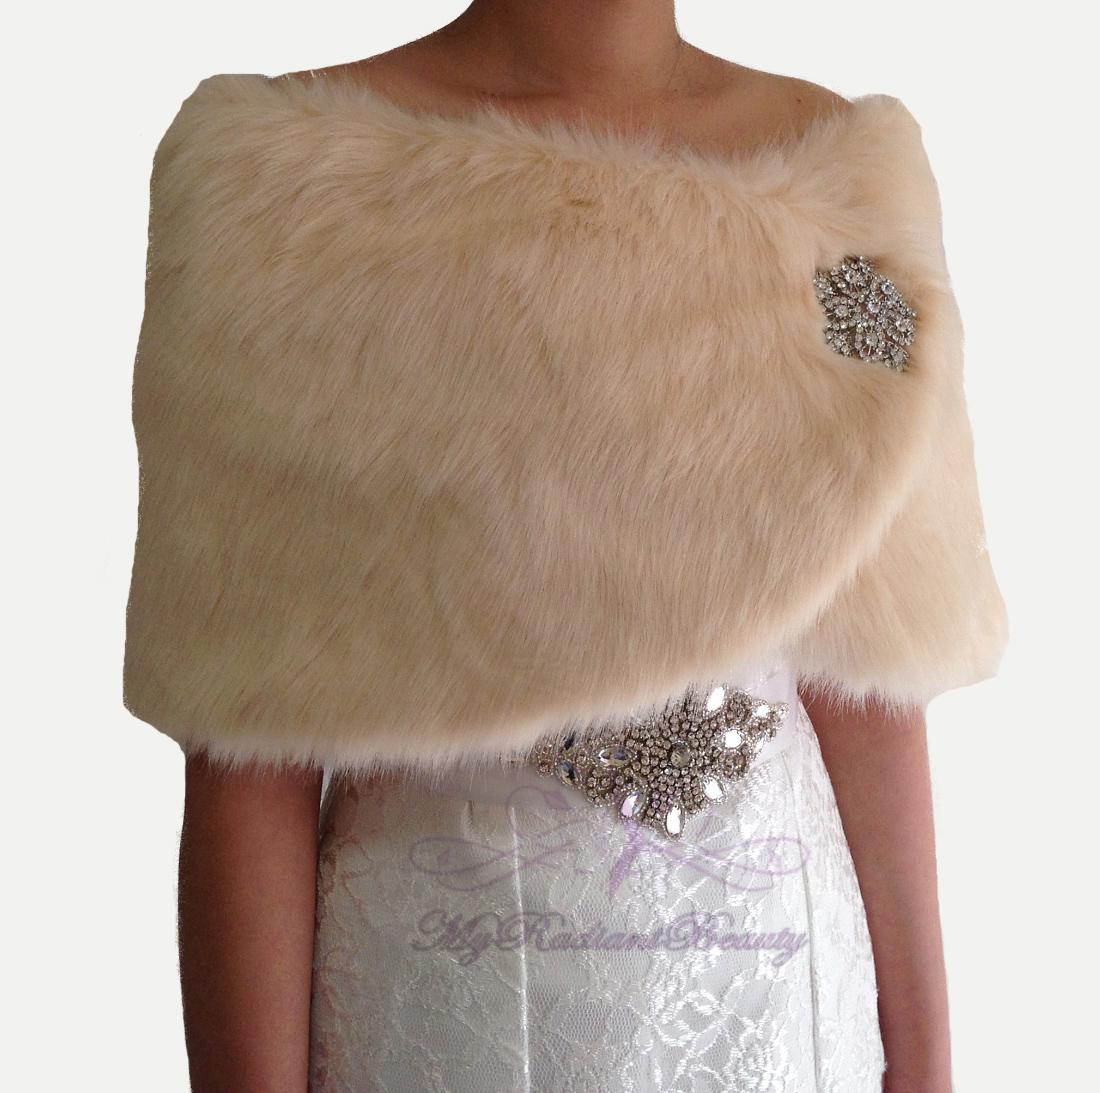 Faux fur wrap bridal champagne faux fur stole bridal fur for Fur shrug for wedding dress